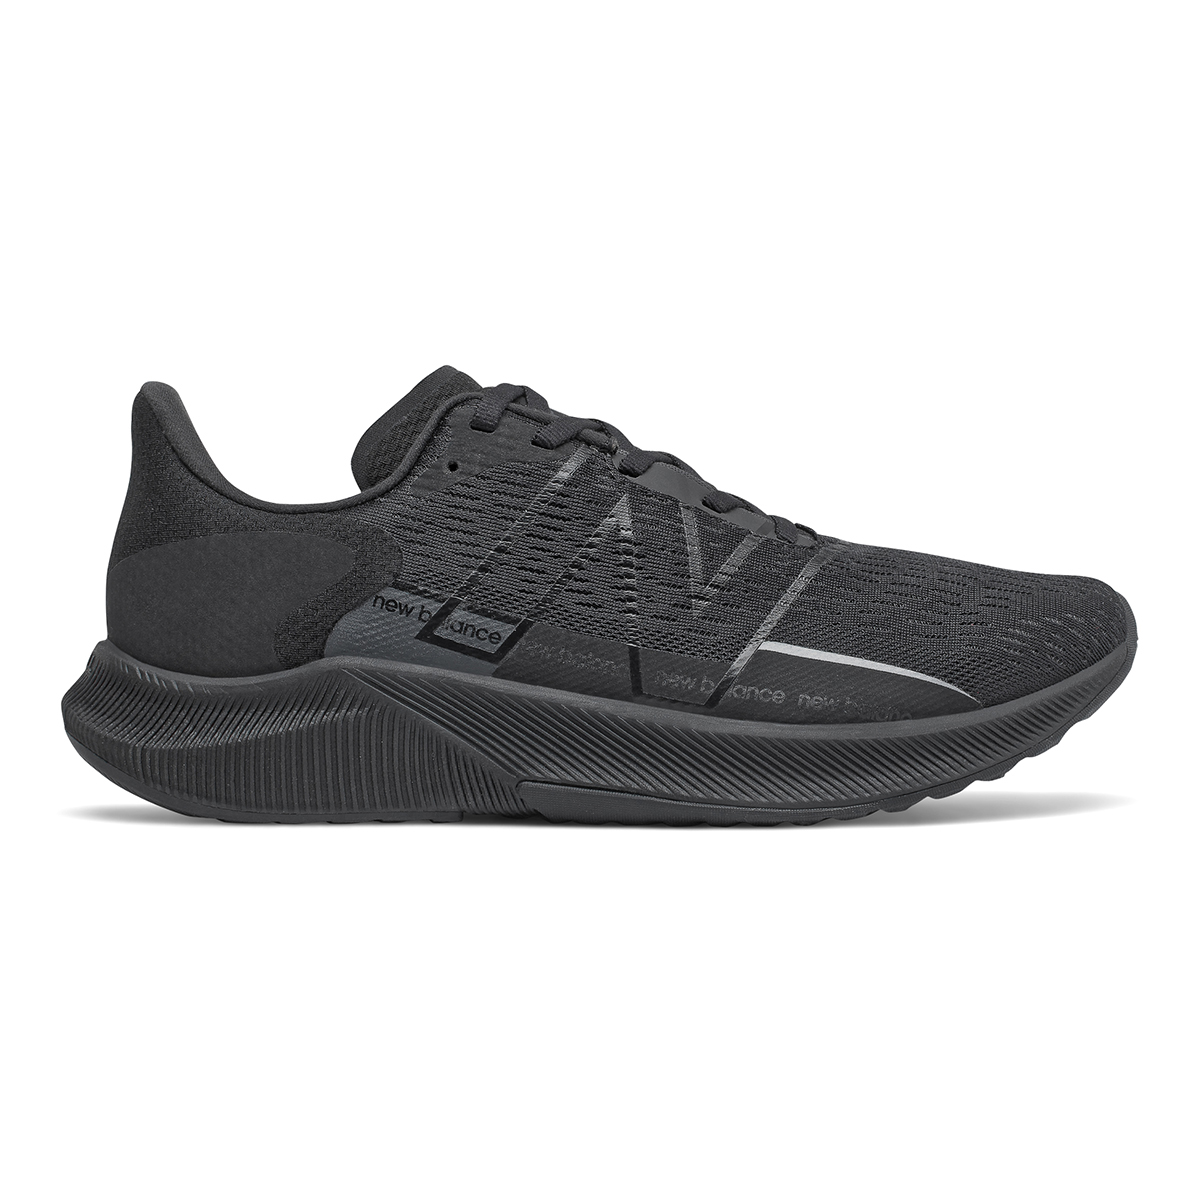 Men's New Balance Fuelcell Propel V2 Running Shoe - Color: Black - Size: 7 - Width: Wide, Black, large, image 1